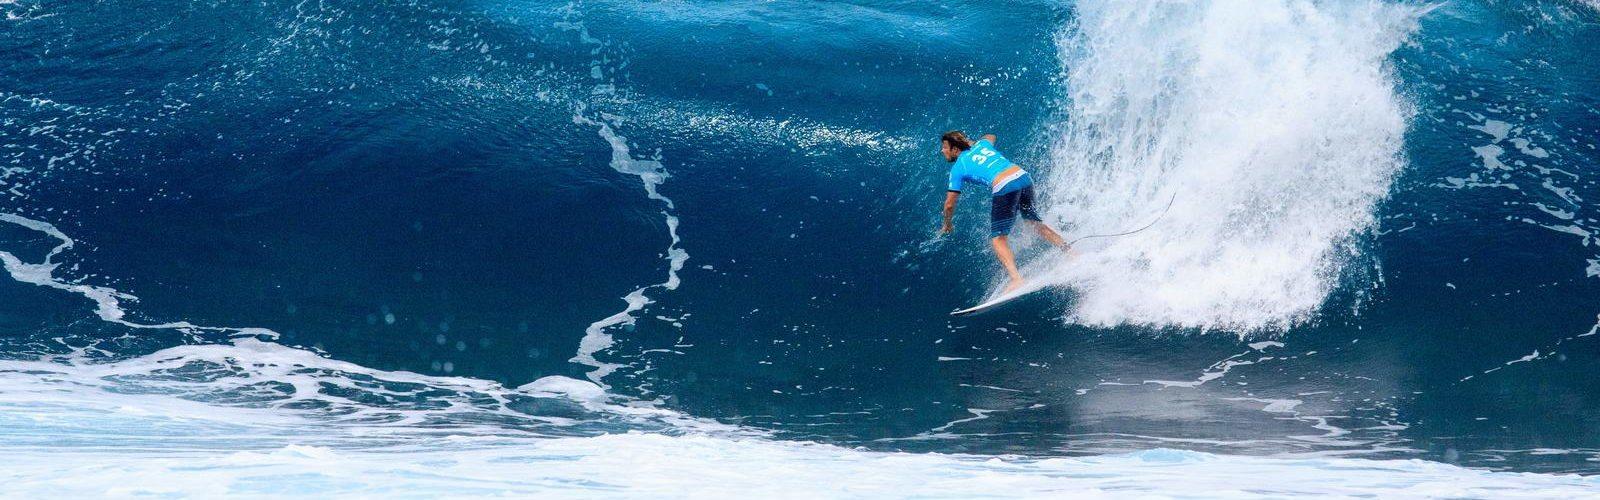 surfer-californie-sport-nautique-une